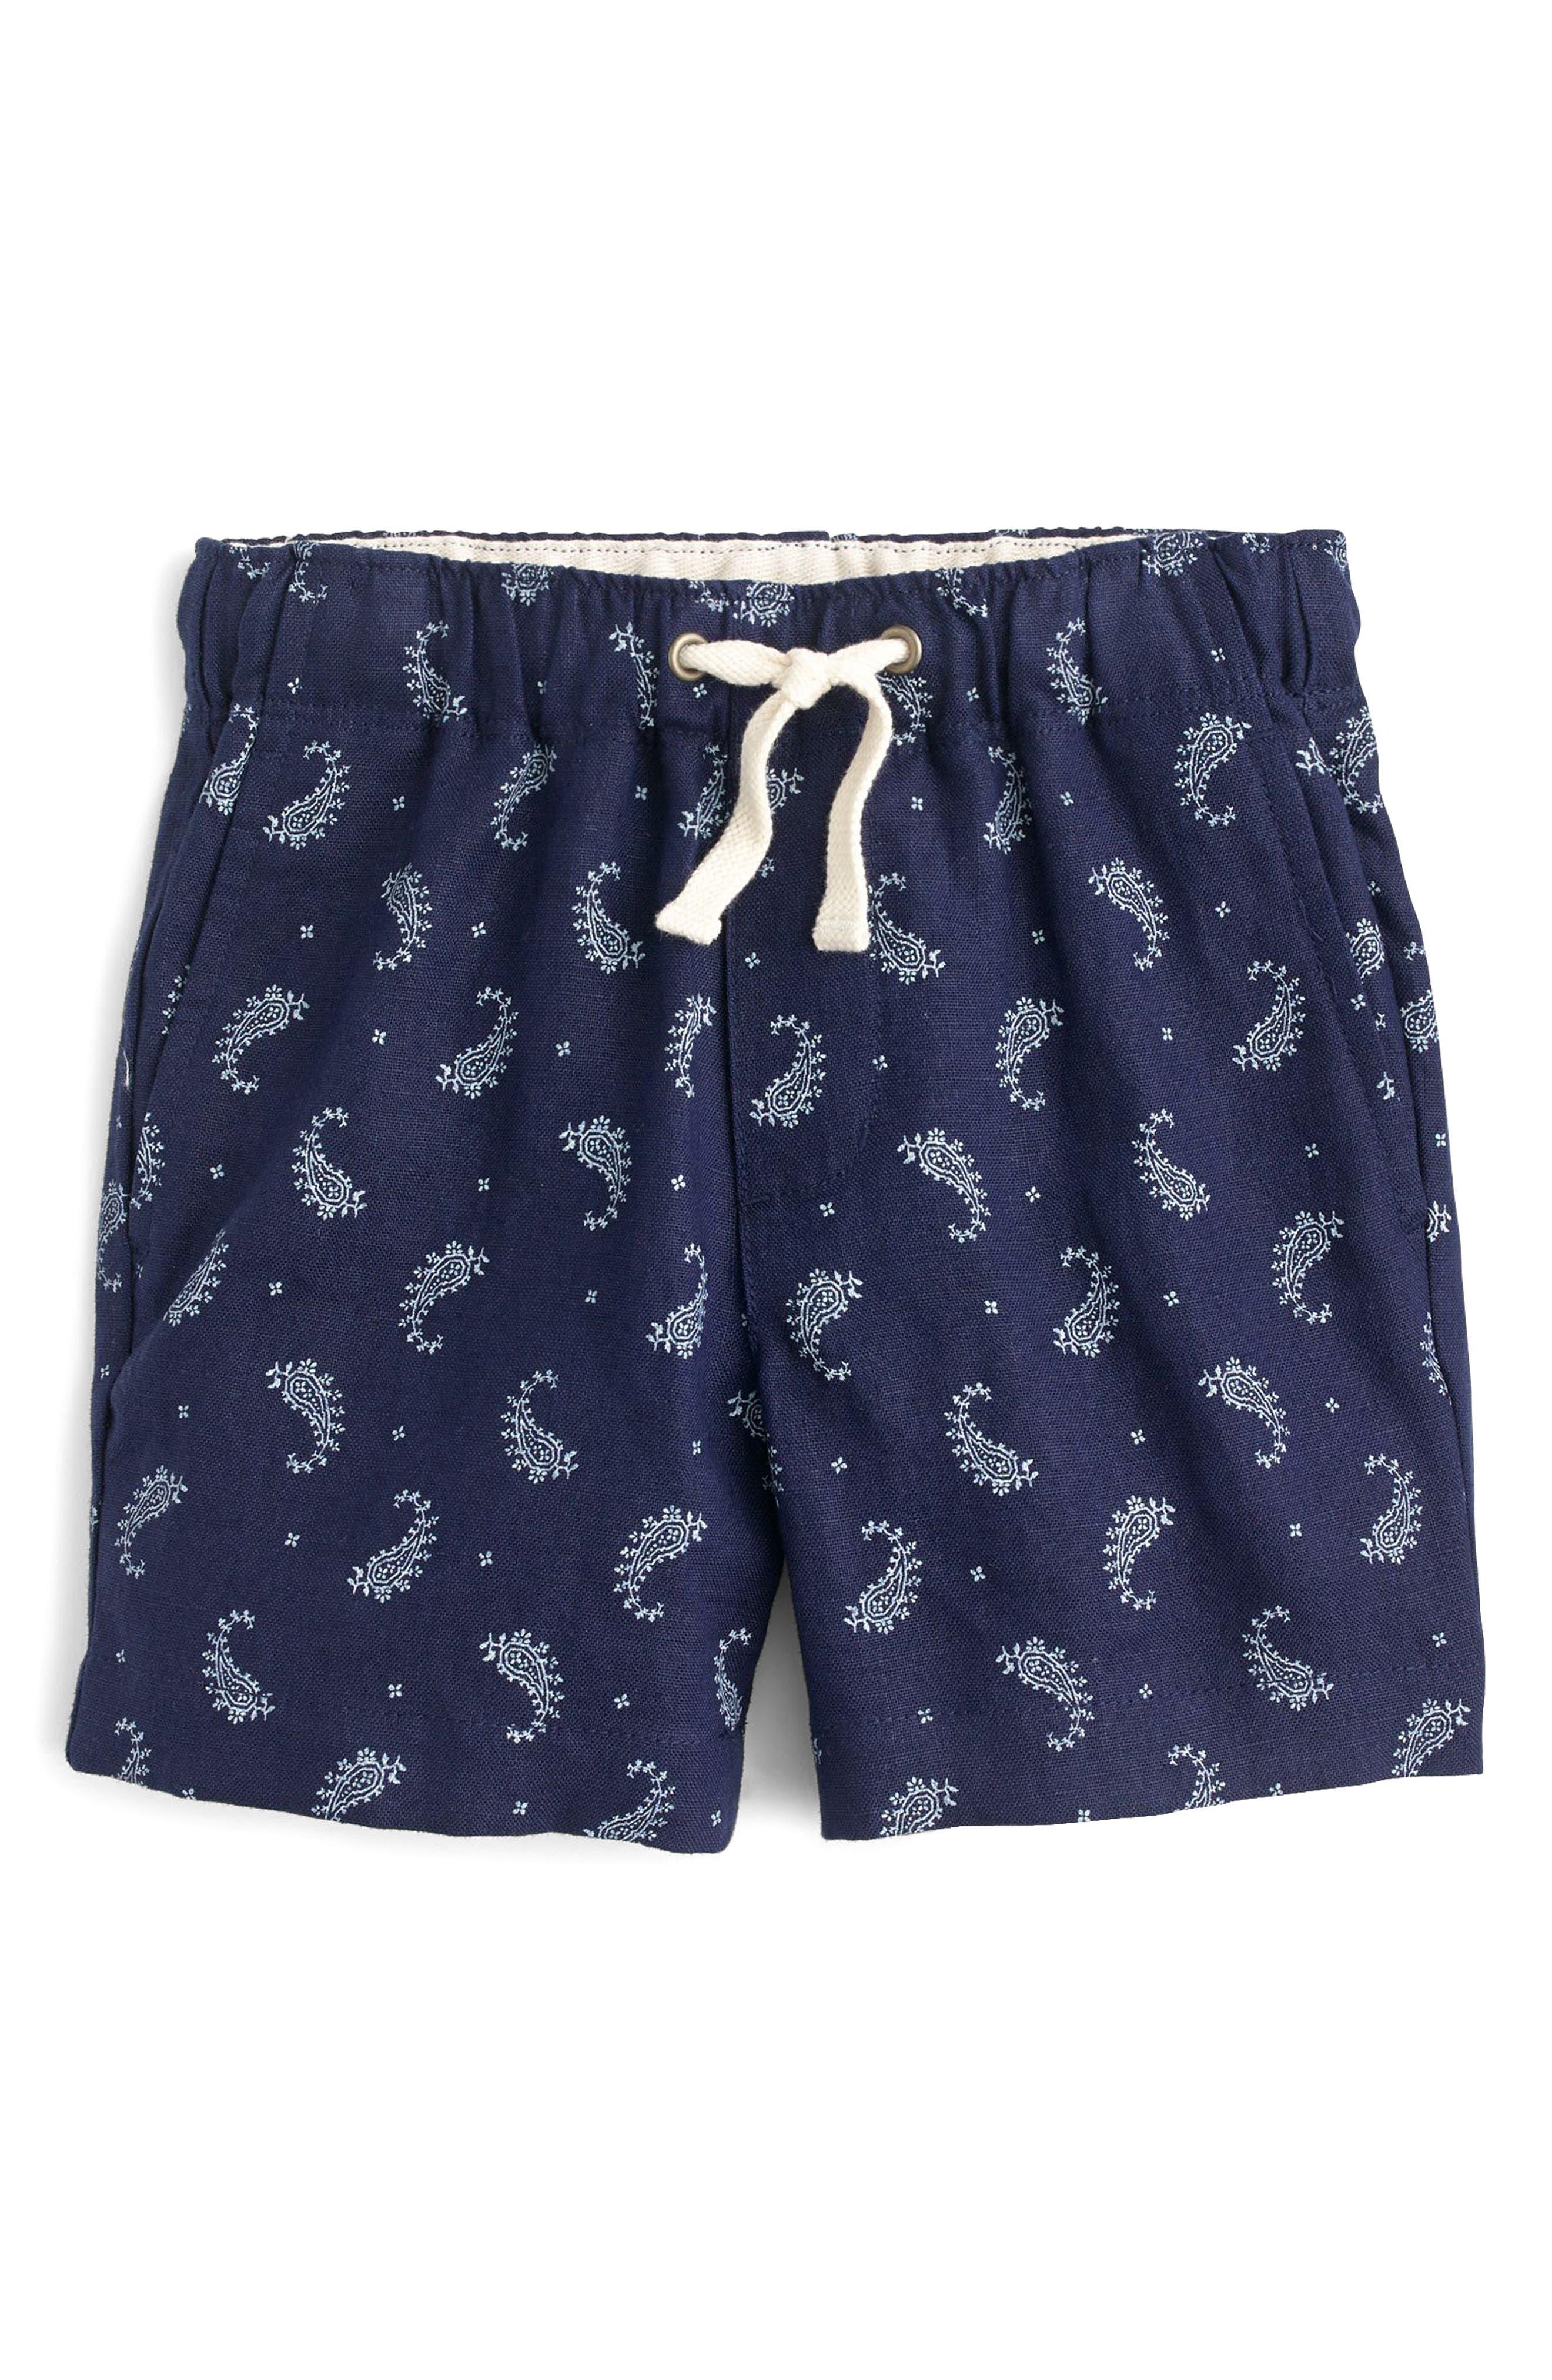 crewcuts by J.Crew Paisley Dock Shorts (Toddler Boys, Little Boys & Big Boys)